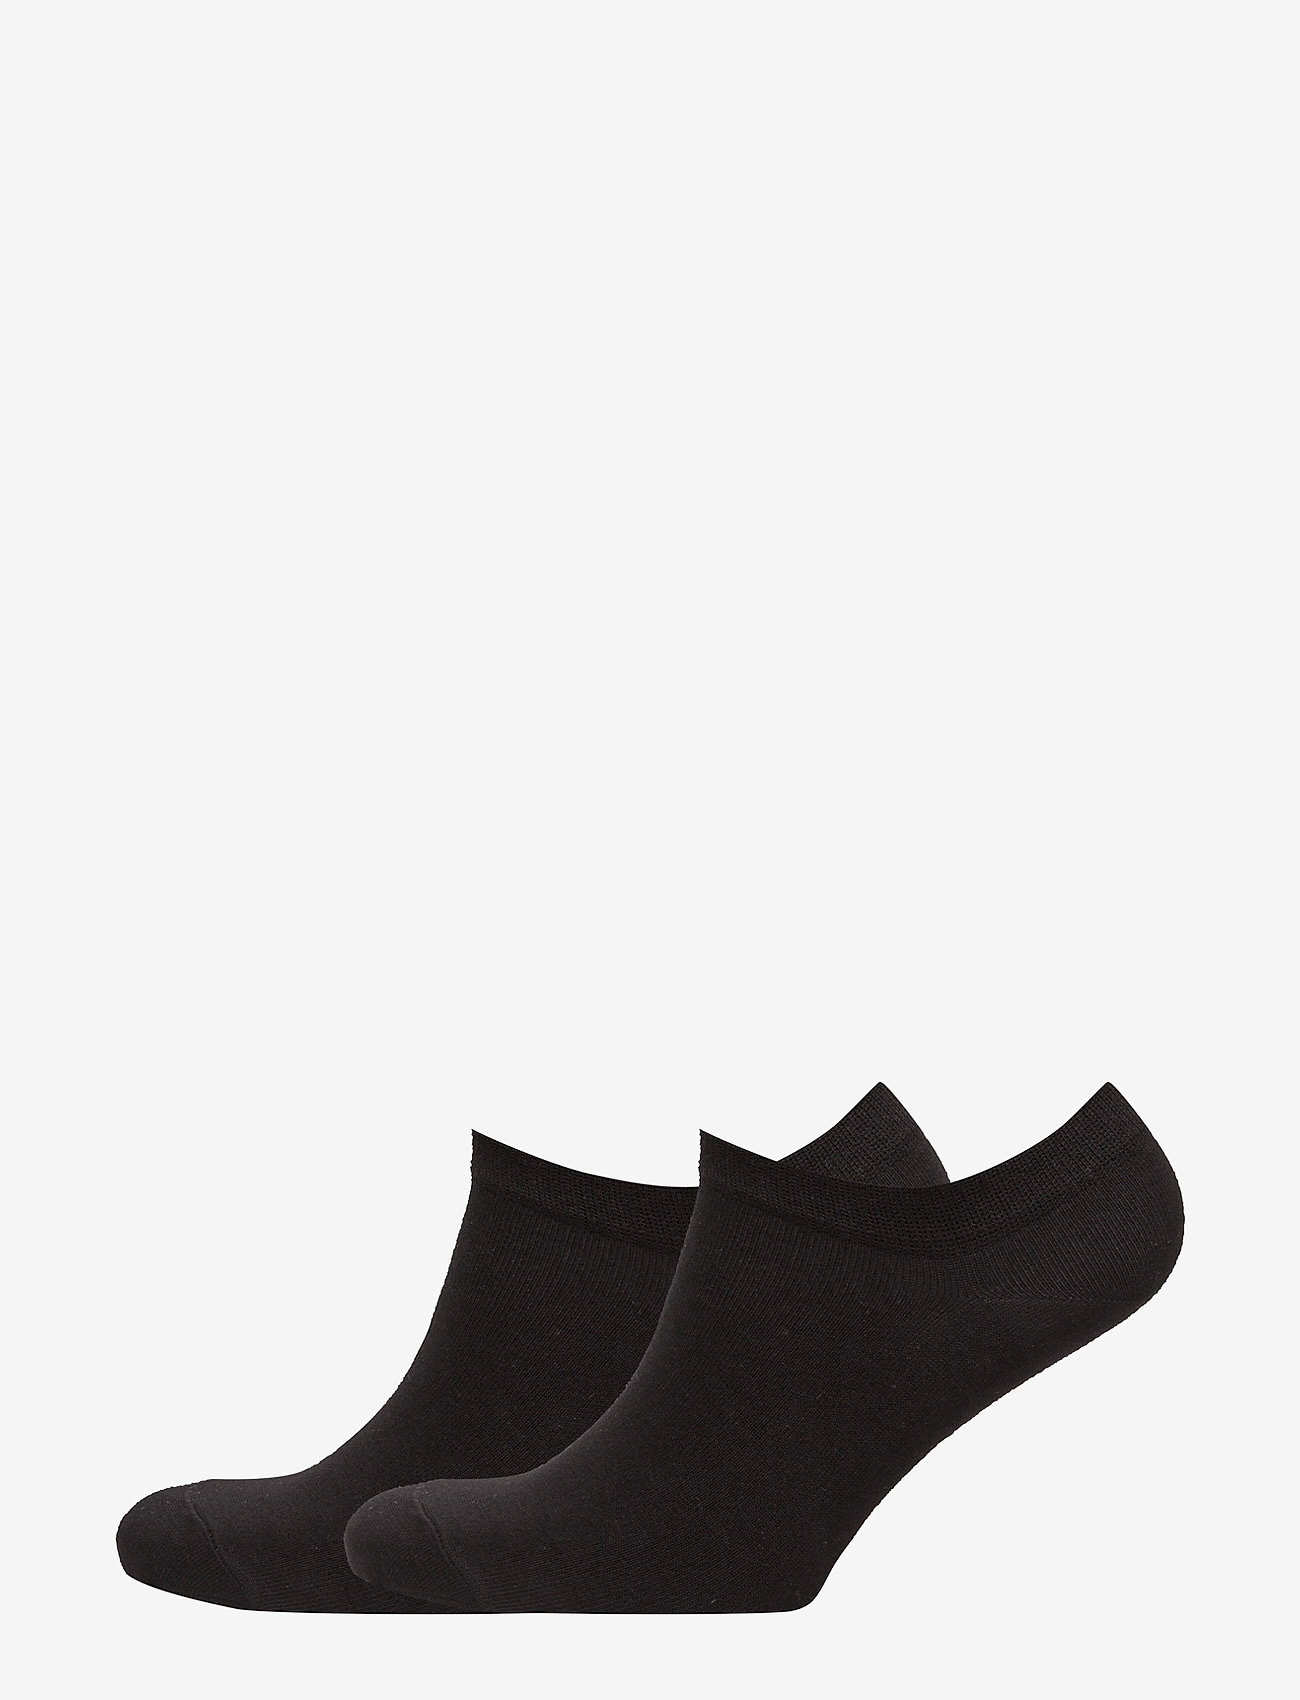 Vogue - Ladies steps, Cotton Steps, 2-pack - sneakersokken - black - 0